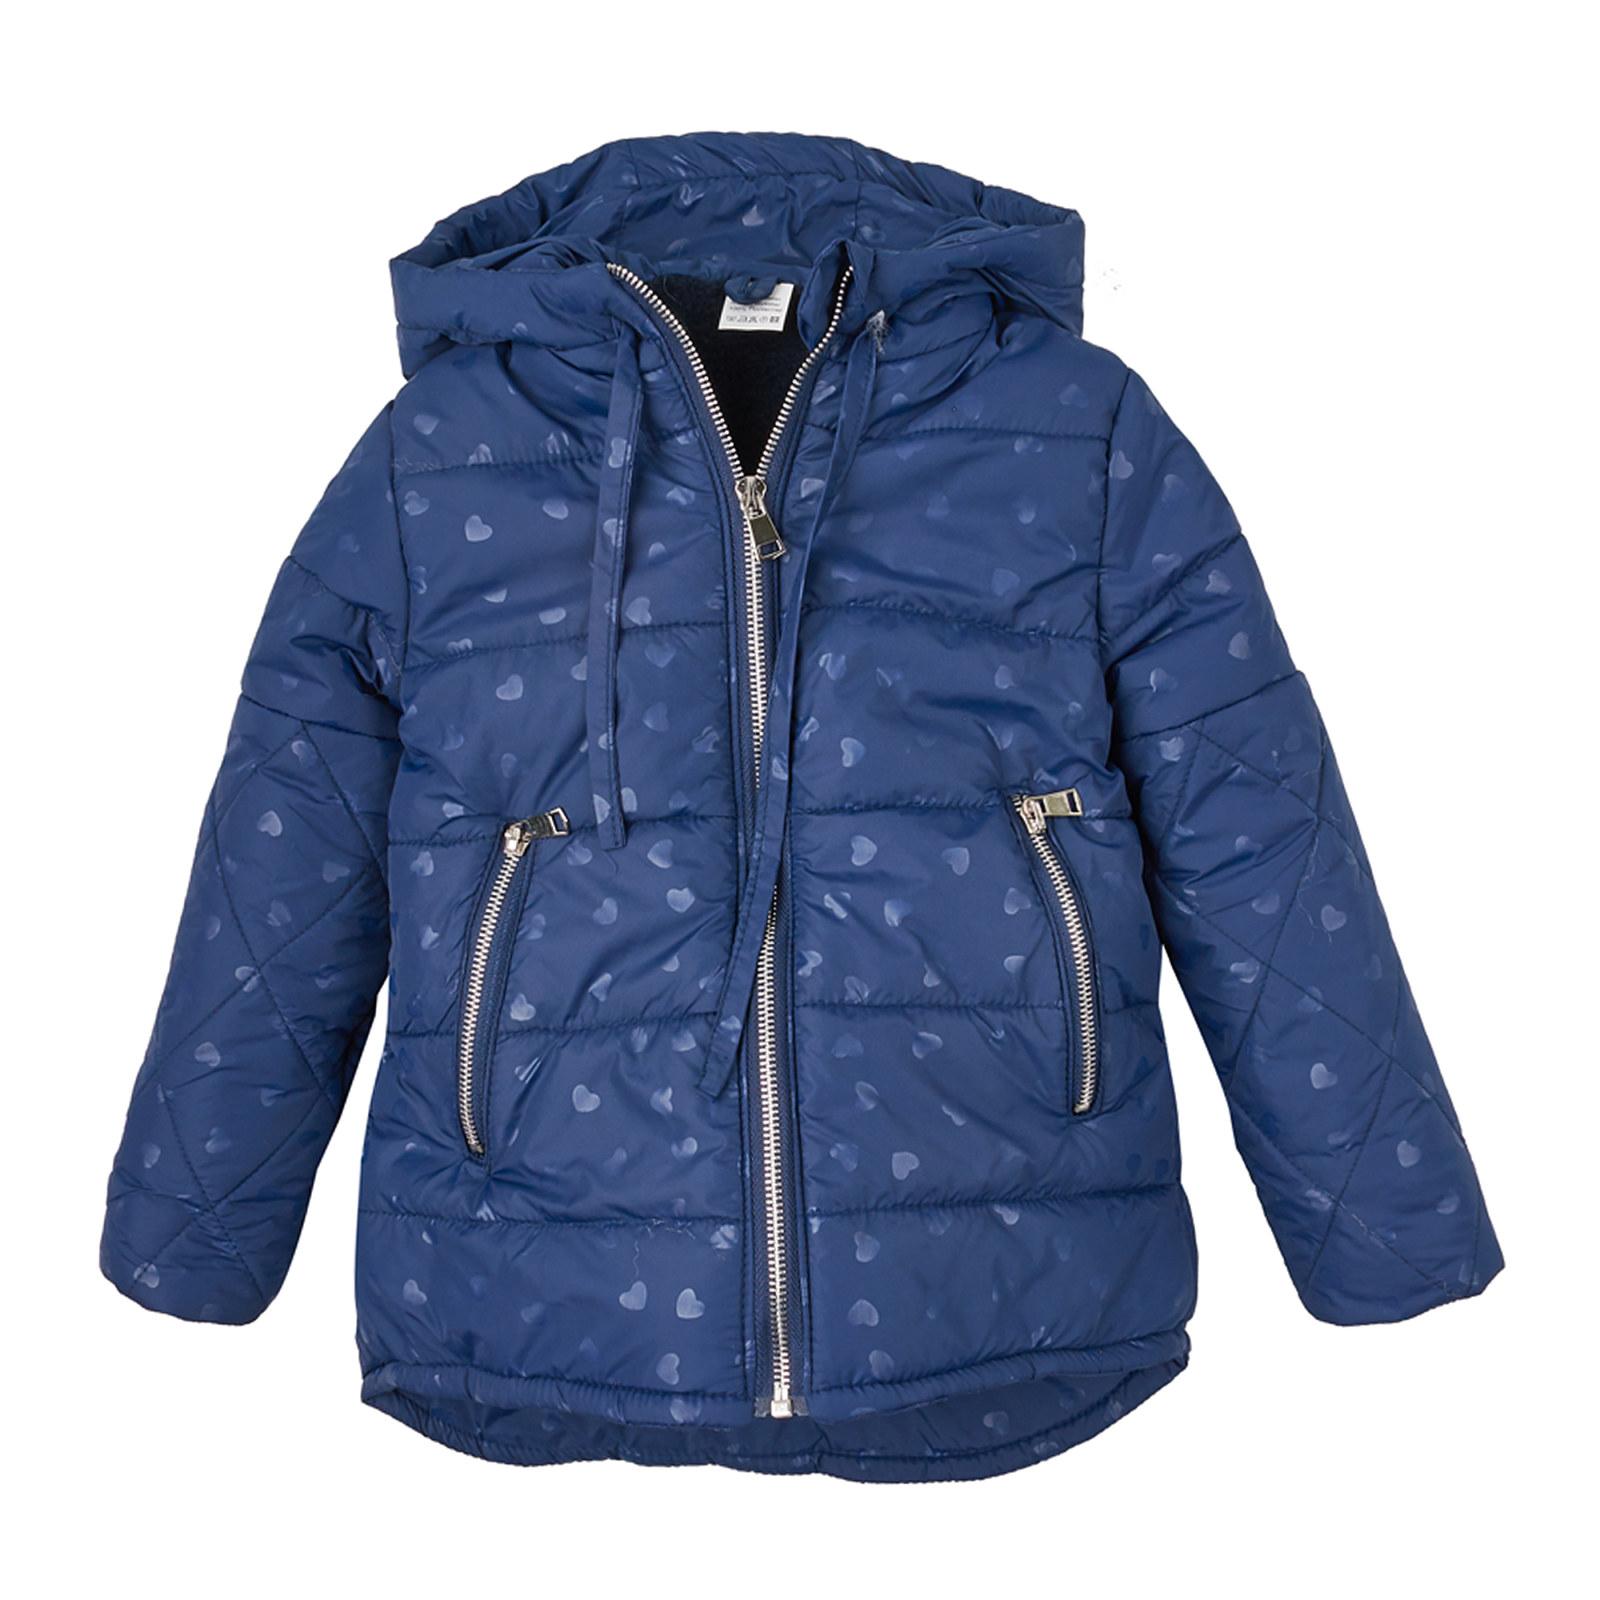 Куртка Одягайко Демисезон - Интернет-магазин Garnamama.com 35bf079a89f83